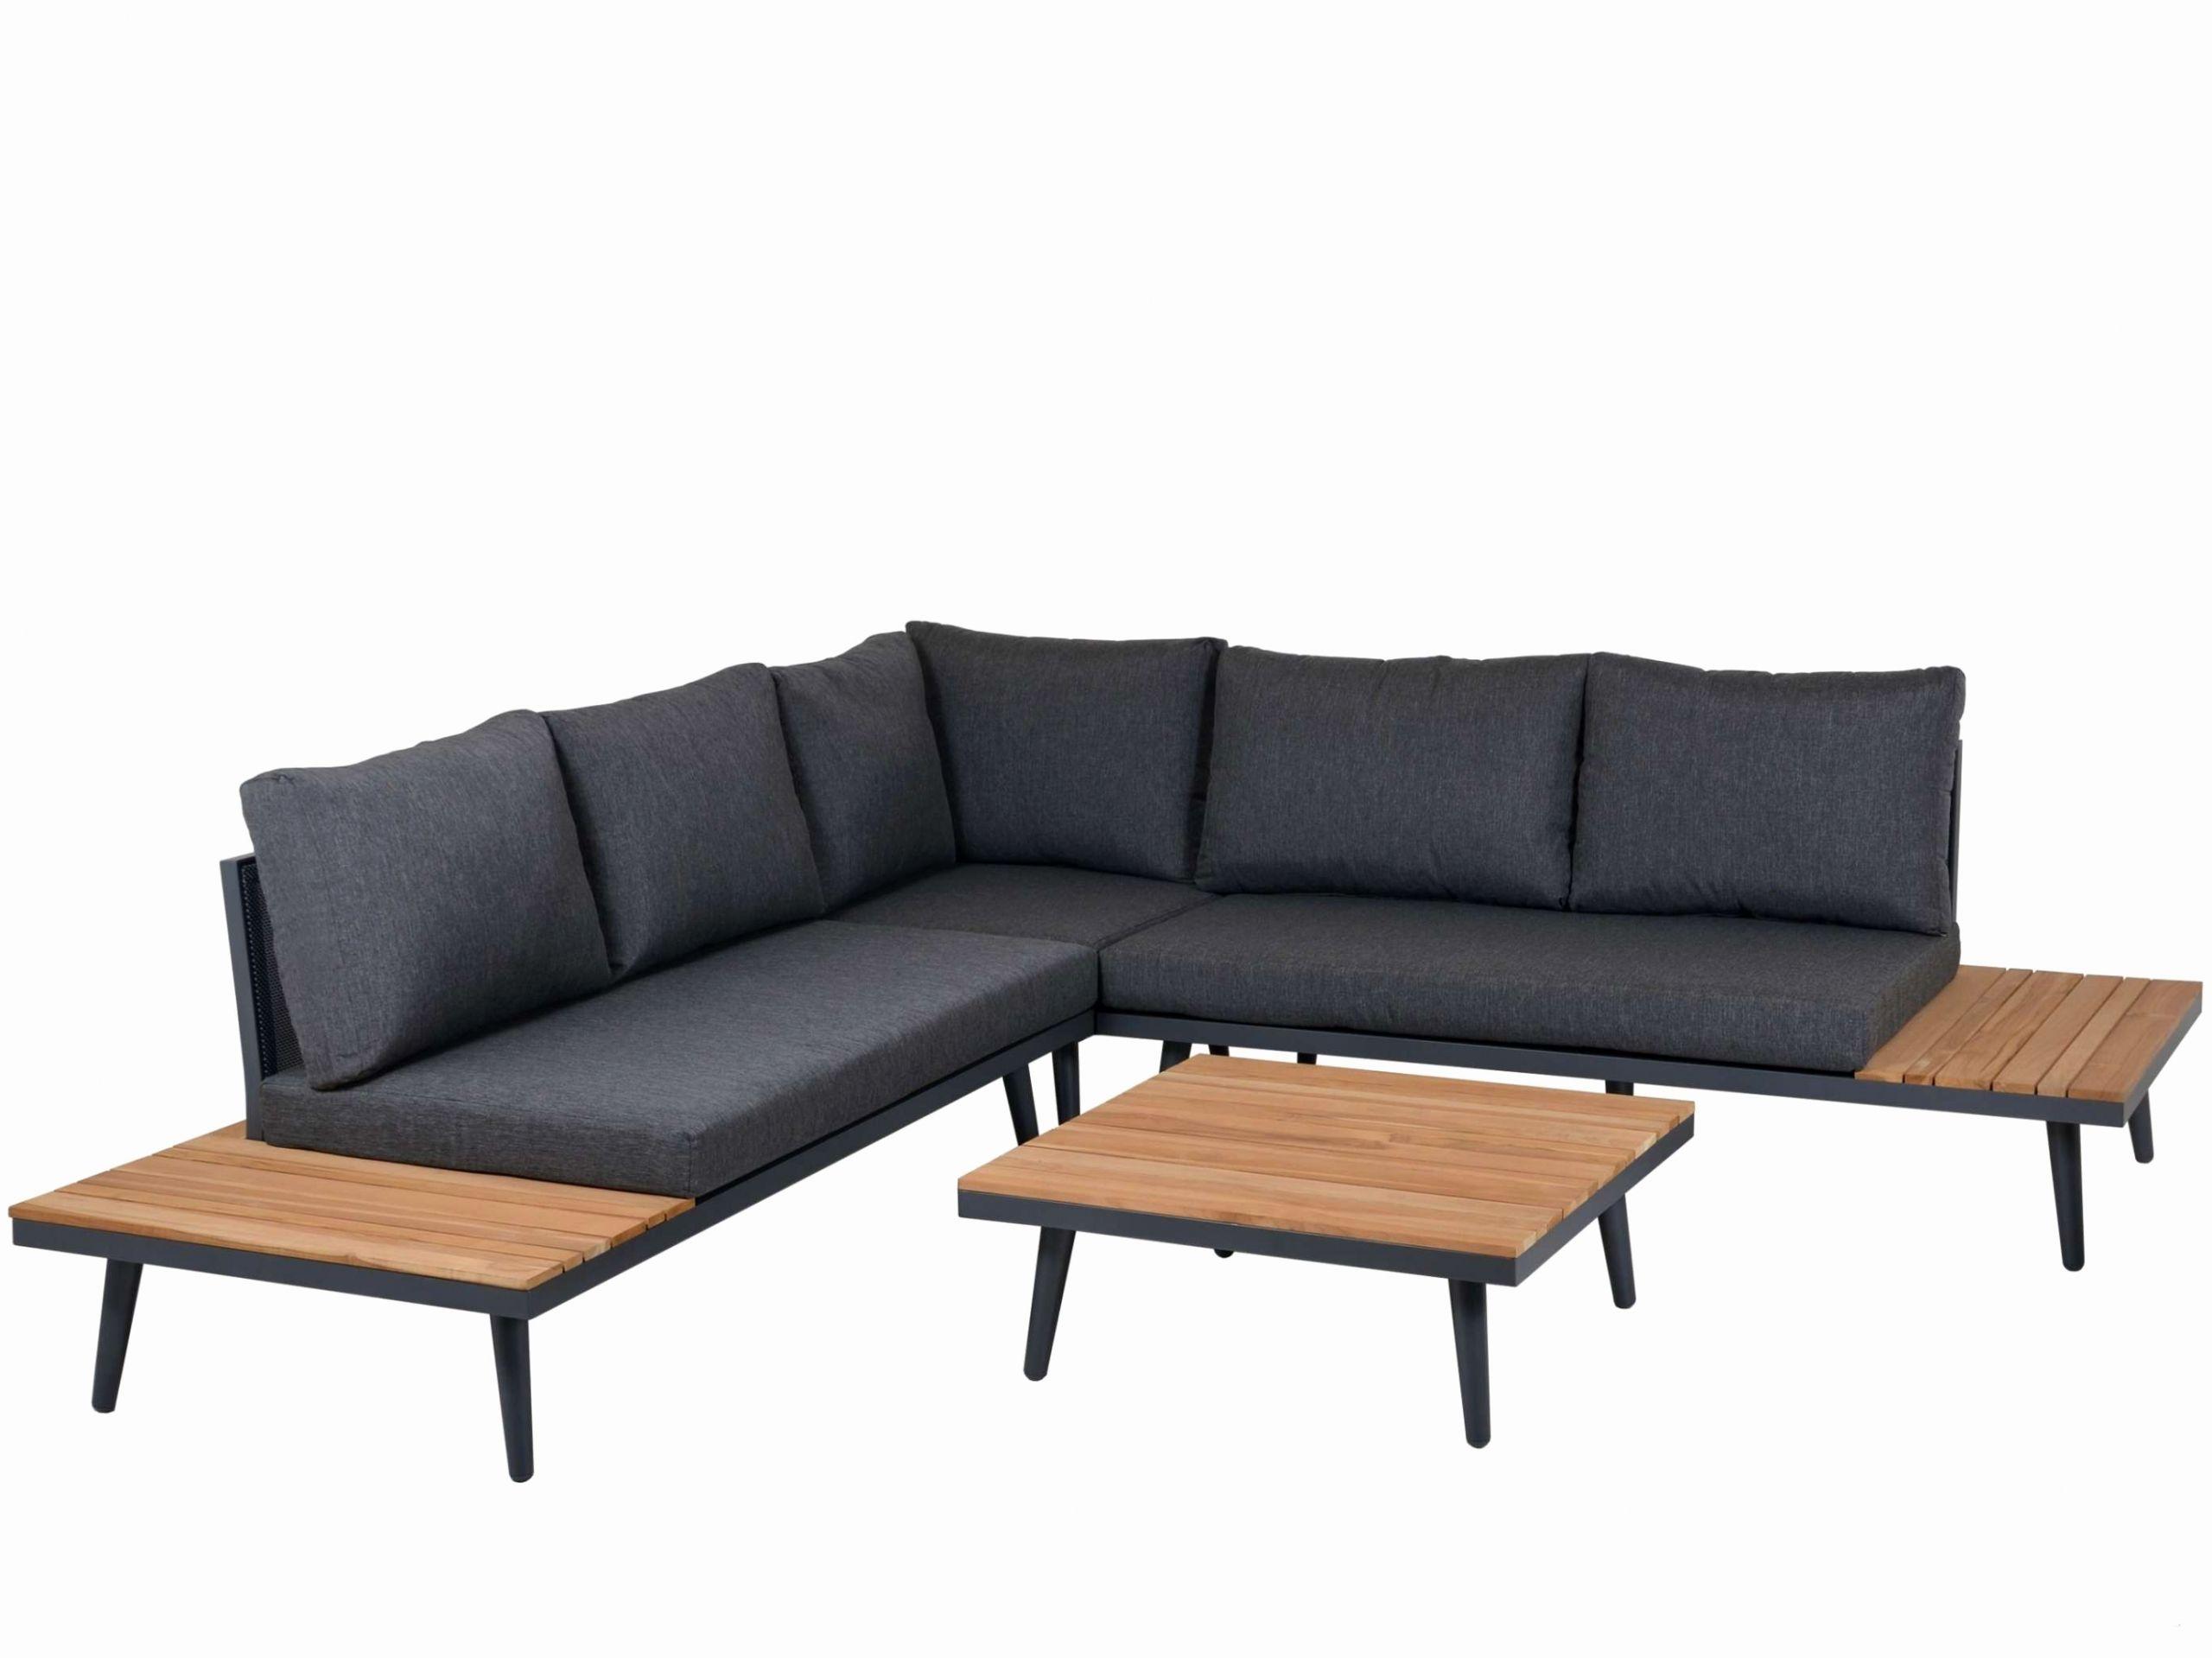 sitzlounge garten einzigartig rattan lounge set cool garten gwzyzvus of coole sessel